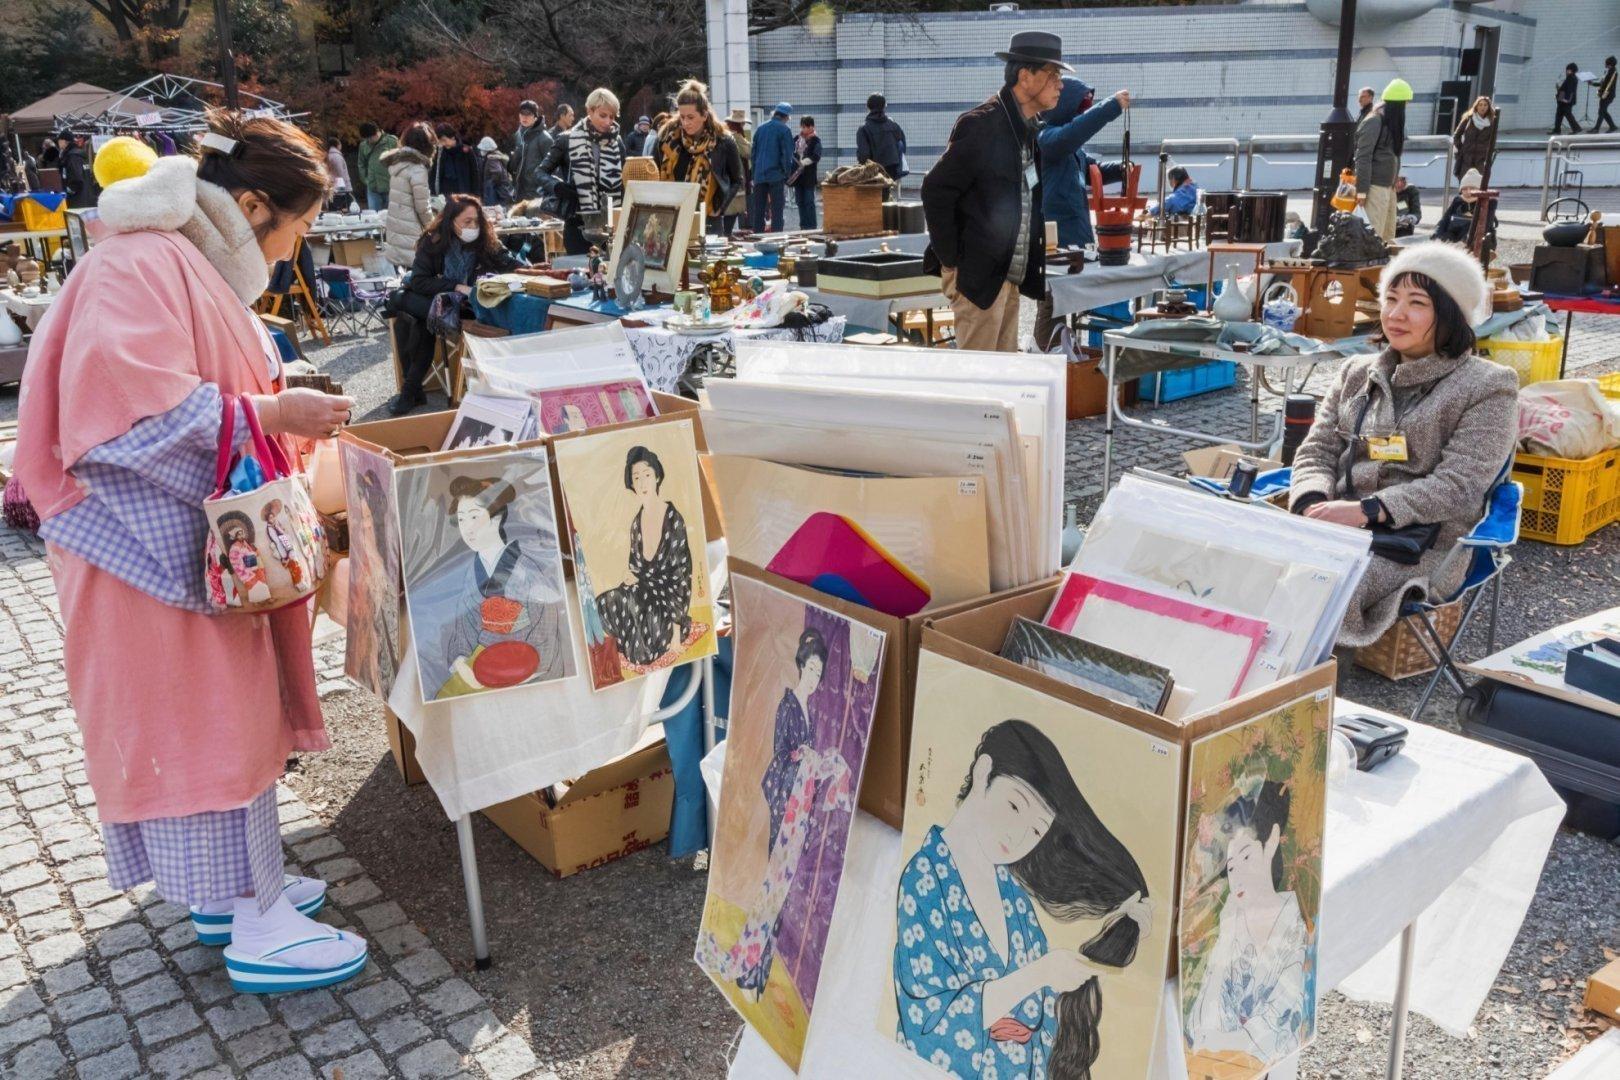 Japan, Honshu, Tokyo, Yoyogi Park, Oedo Antique Market, Lady Dressed in Kimono Shopping